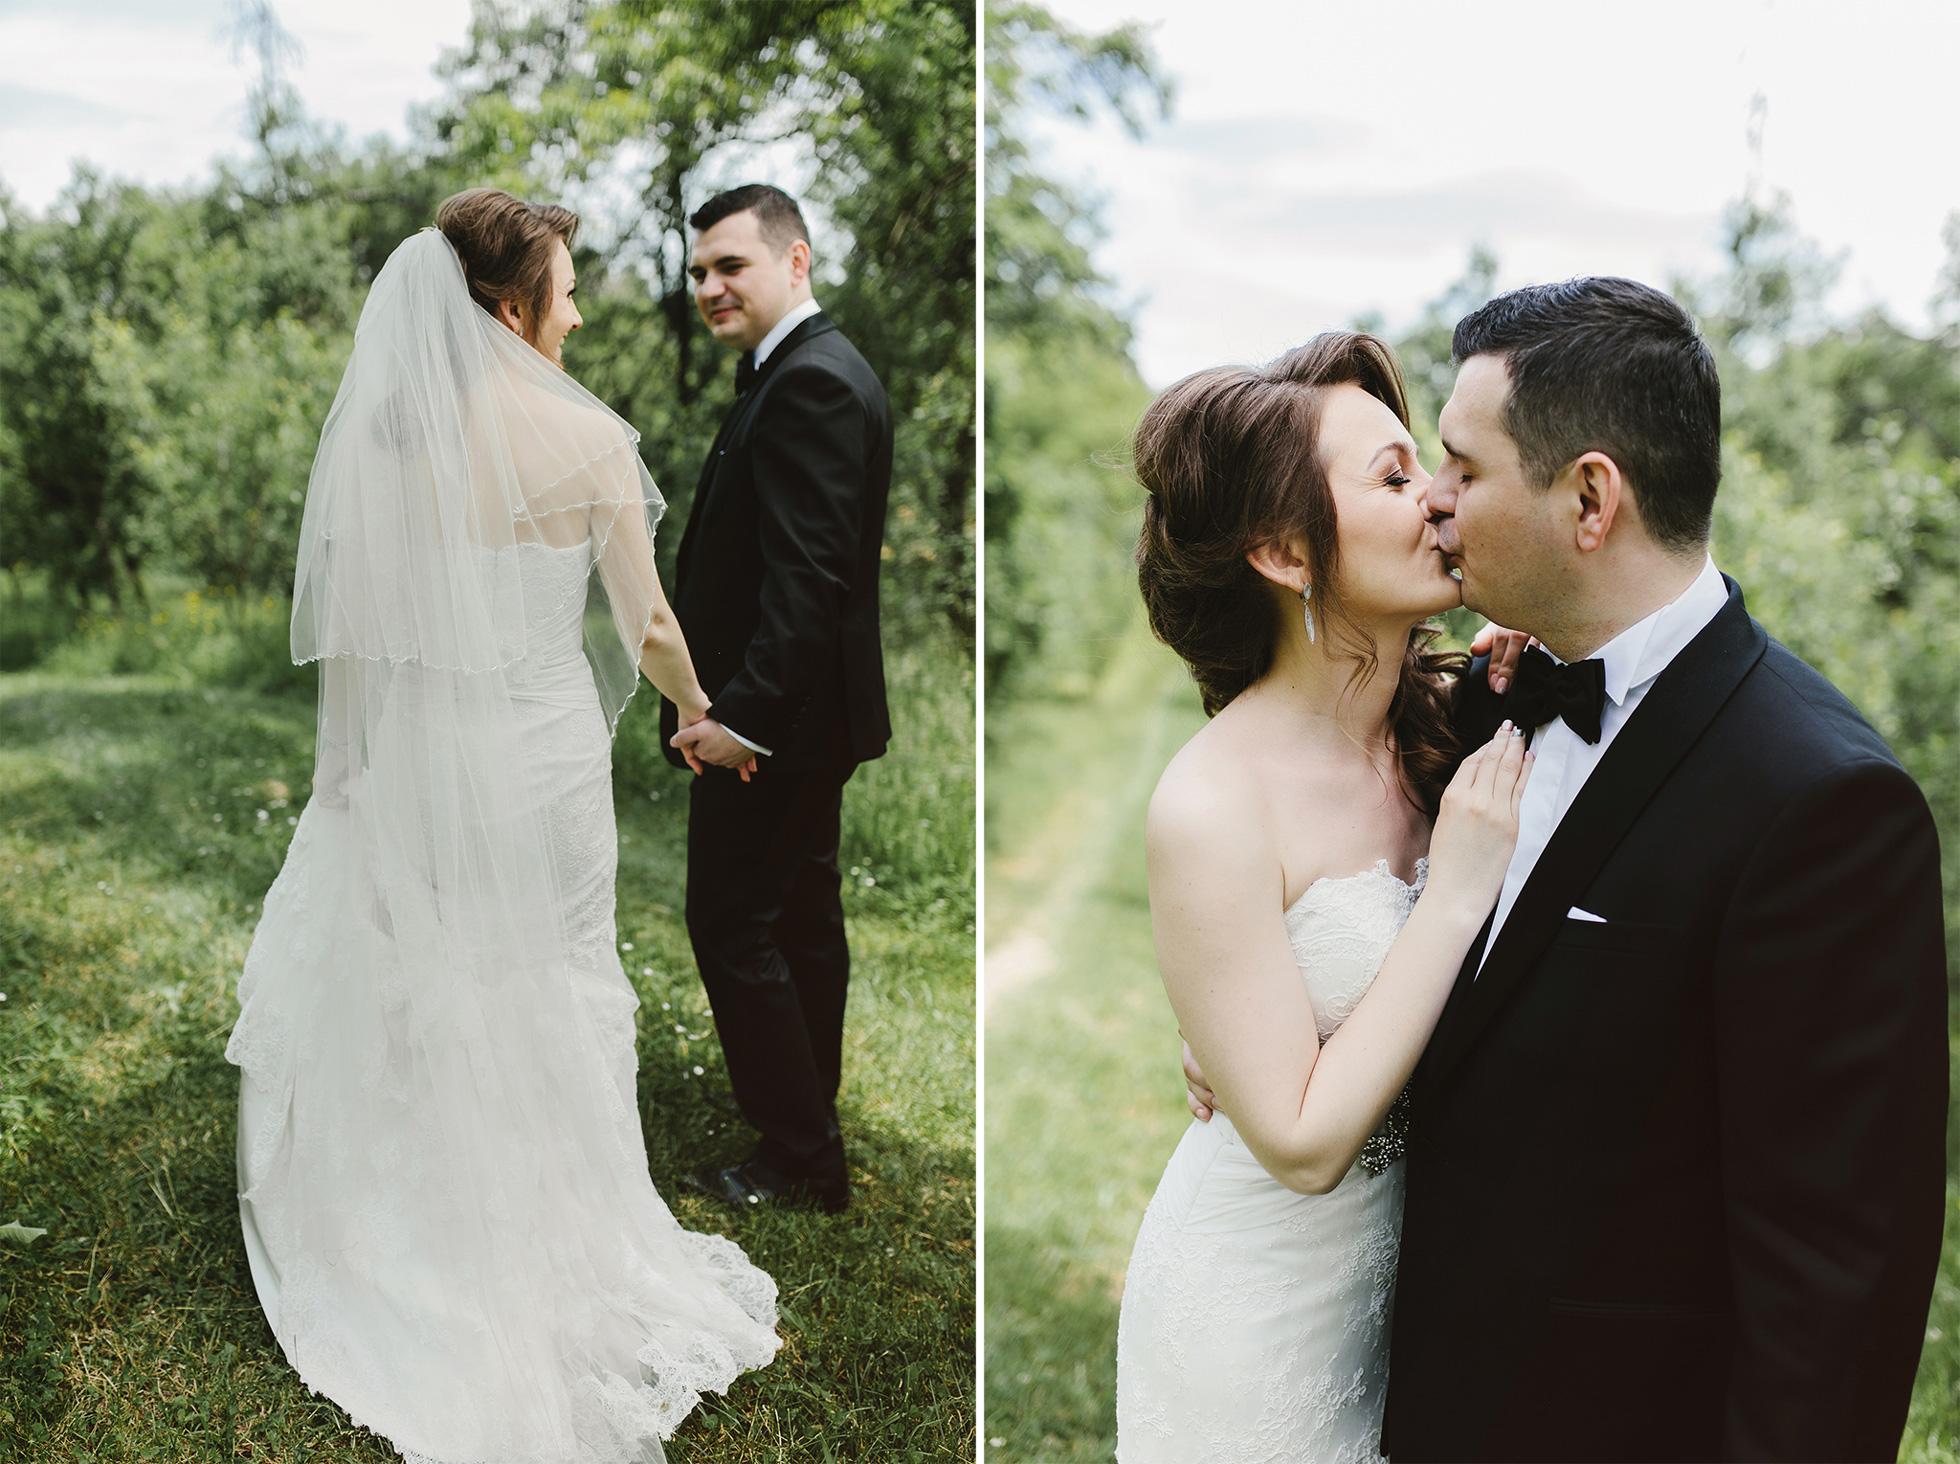 Liana-+-Florin-{wedding}-110